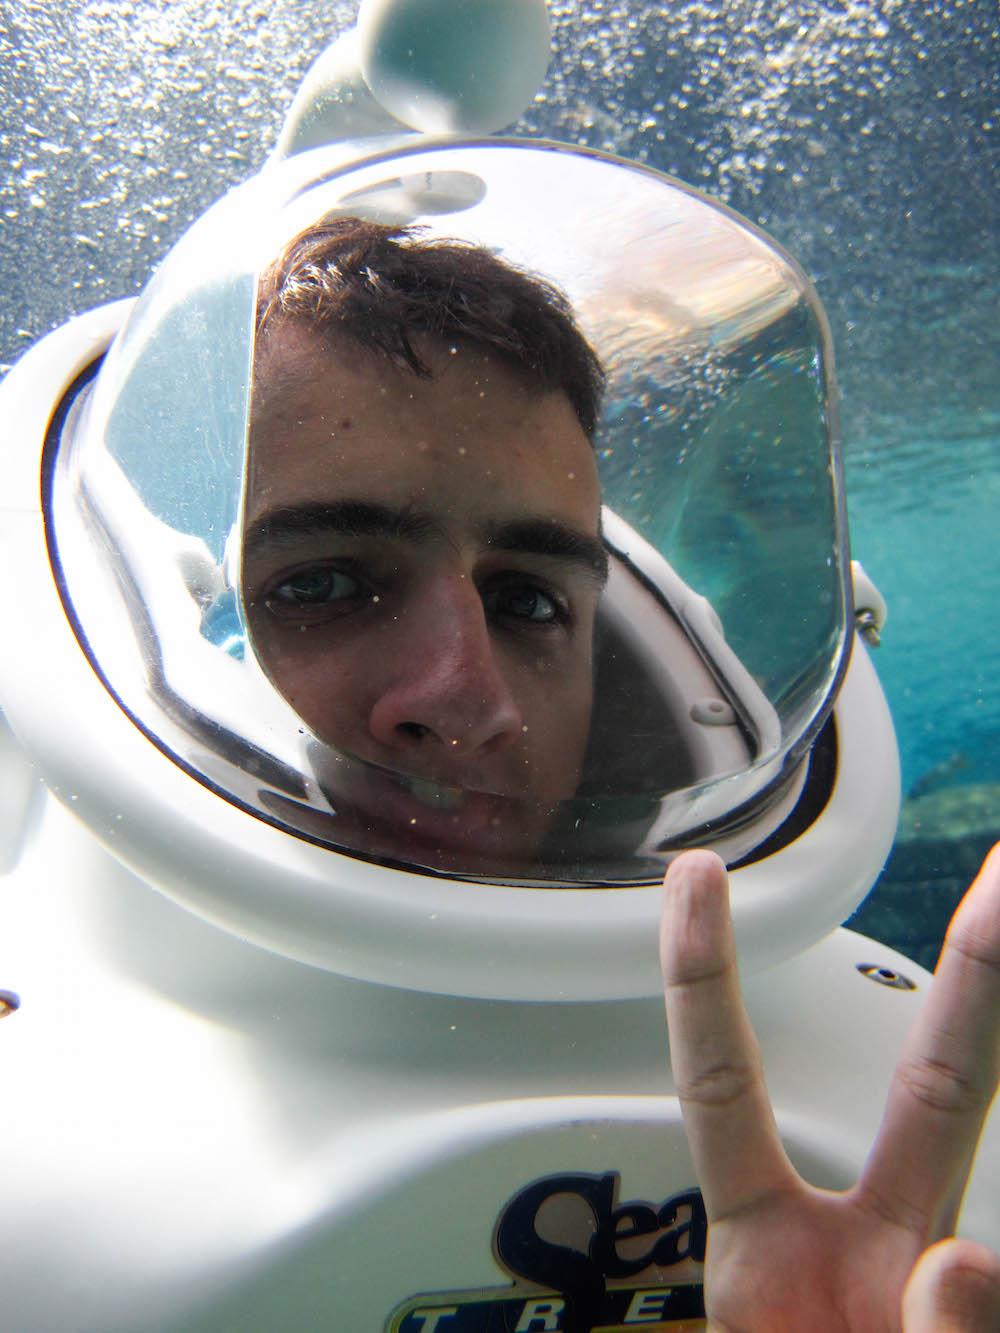 UnderwaterSelfie